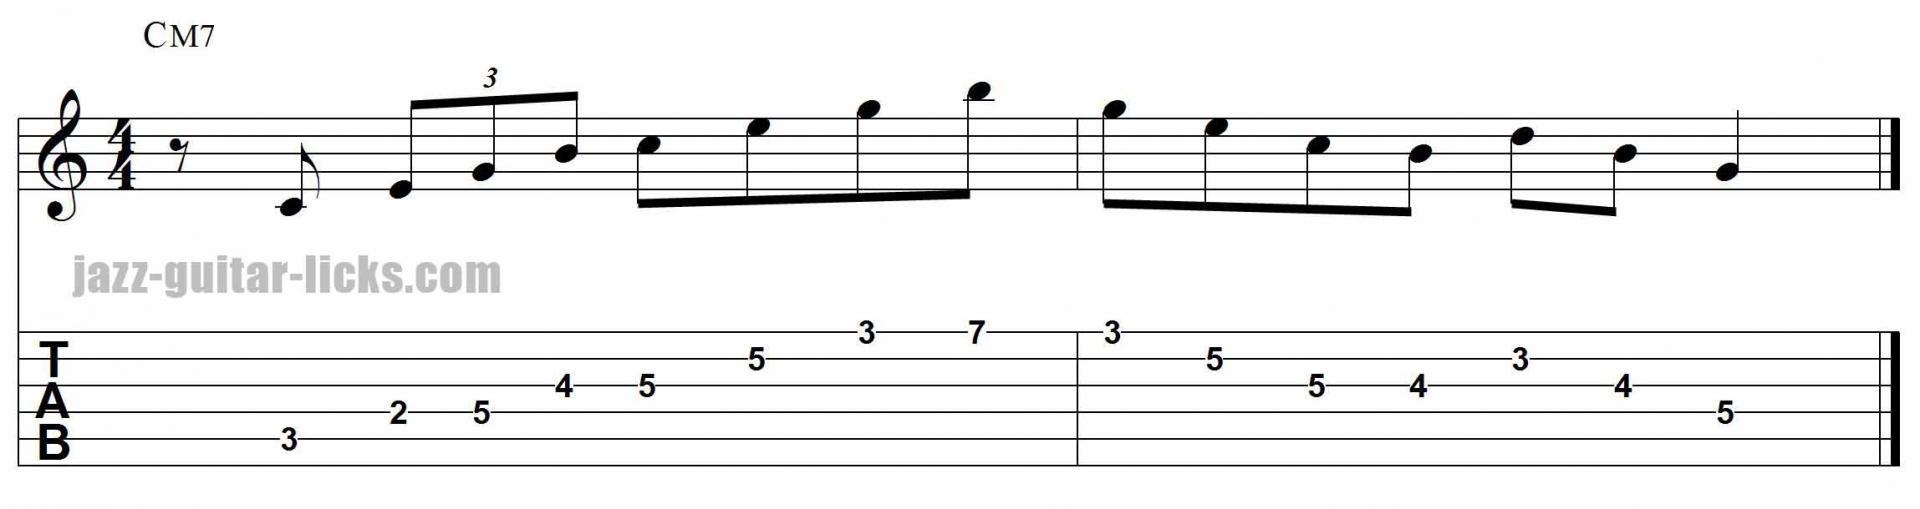 Major 7th arpeggio jazz guitar lick with tab